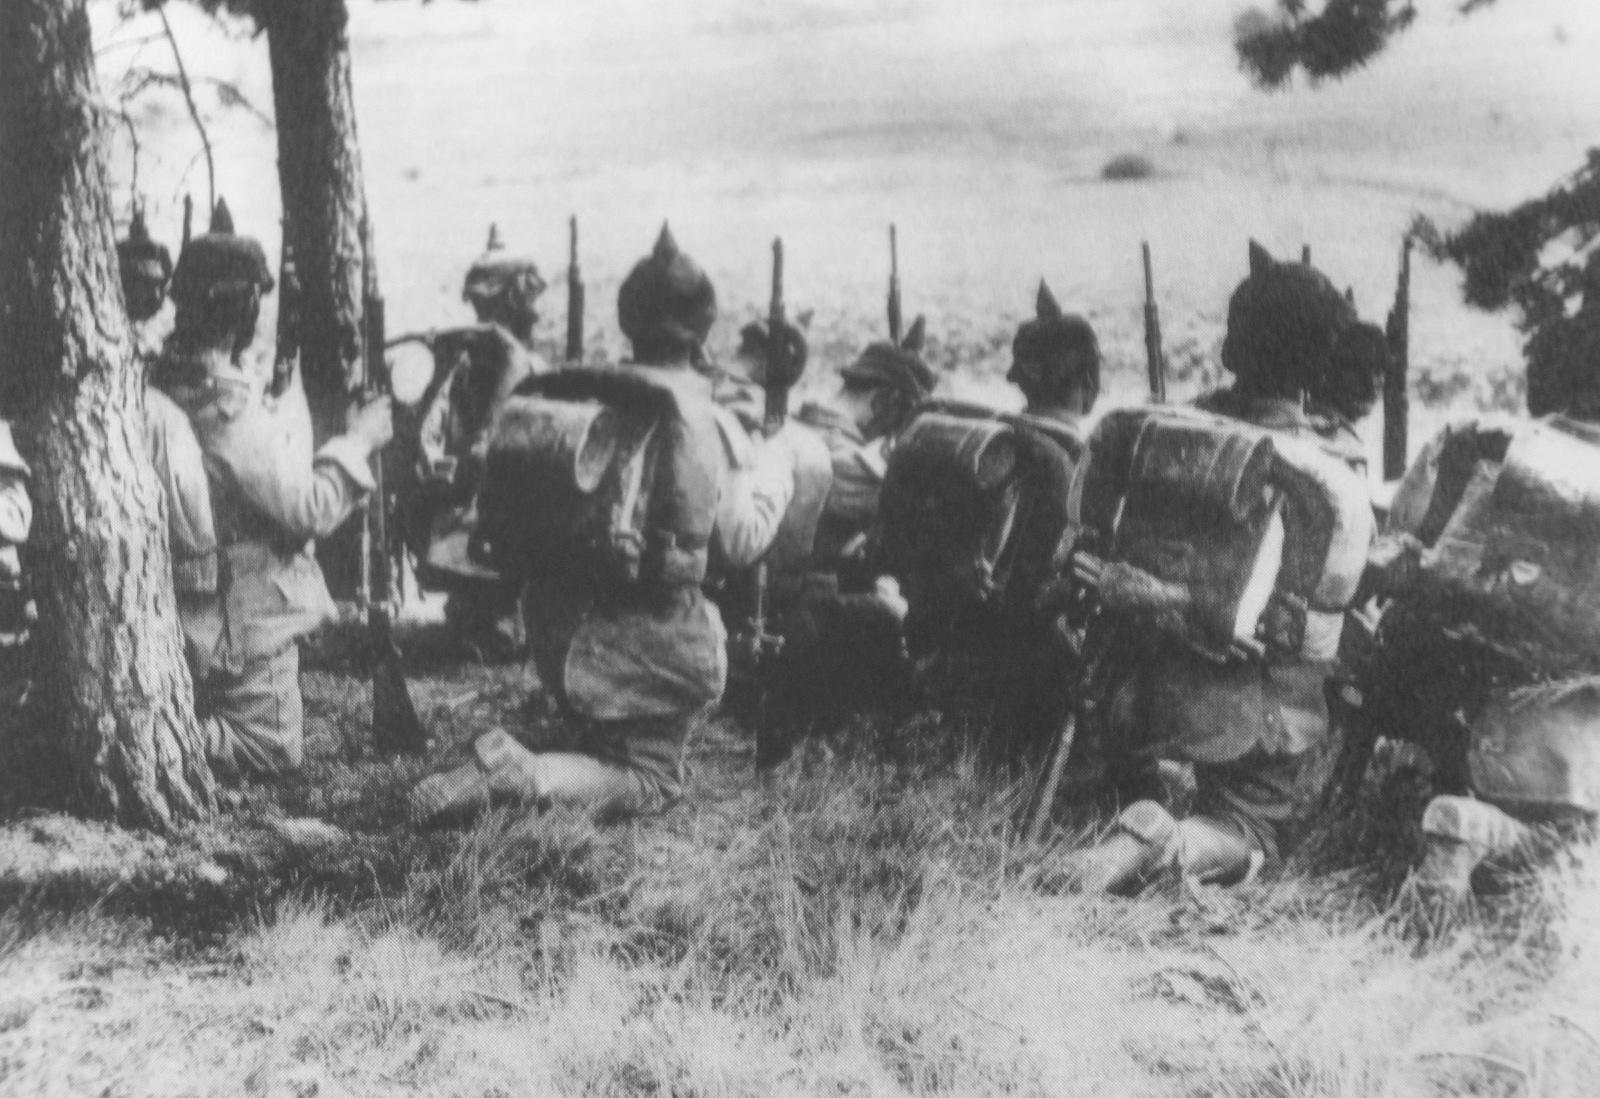 2. august 1914. Tyske tropper besætter Luxemburg. Ultimatum til Belgien.